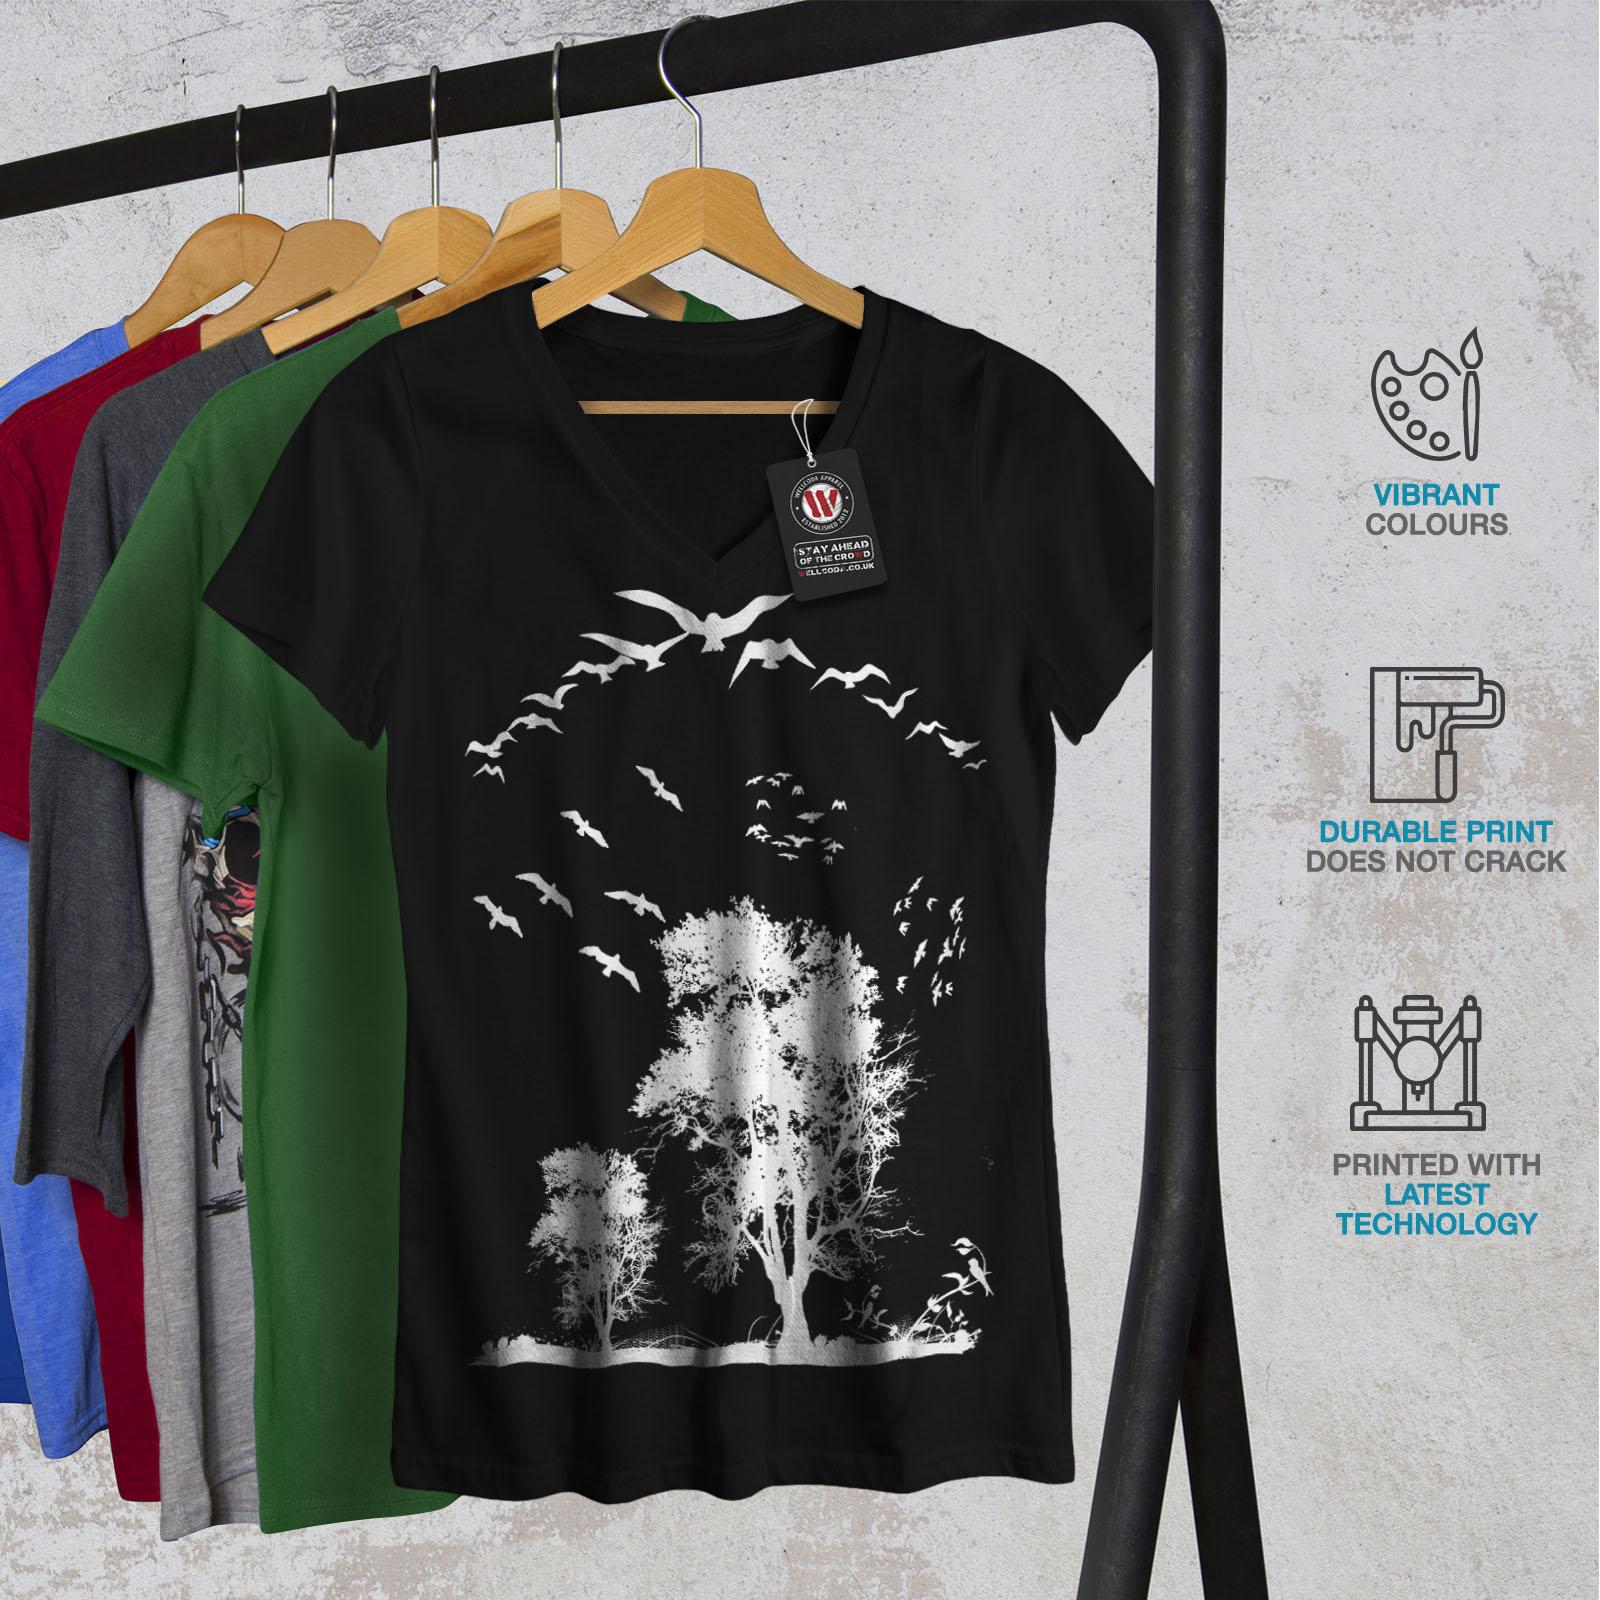 thumbnail 4 - Wellcoda-Bird-Freedom-Fly-Womens-V-Neck-T-shirt-Nature-Graphic-Design-Tee